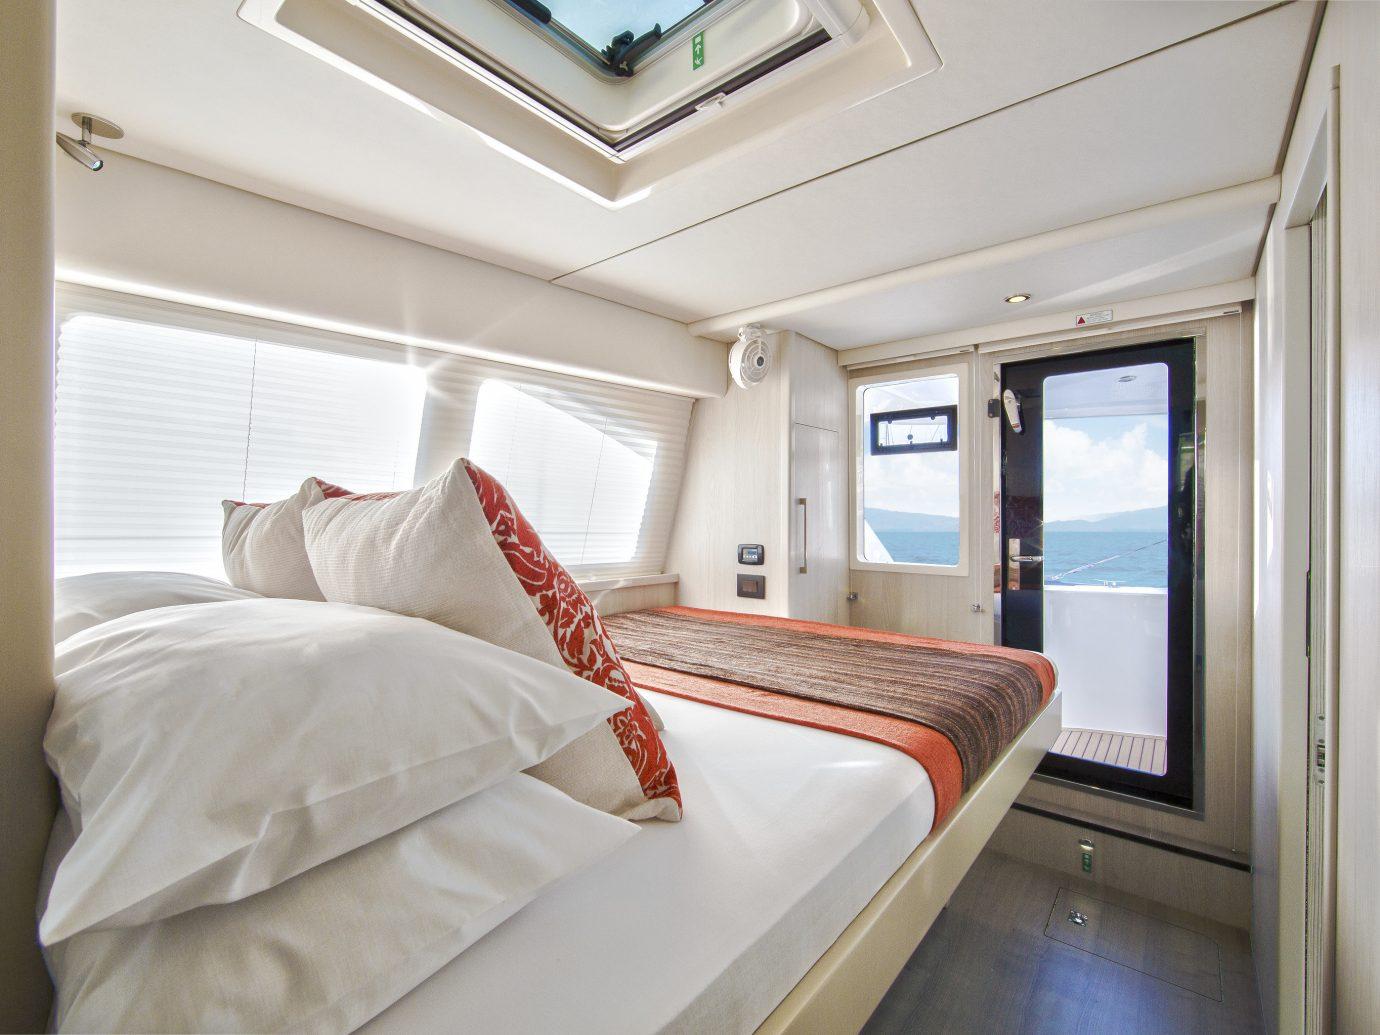 Trip Ideas indoor bed room window Bedroom white real estate Cabin Suite interior design